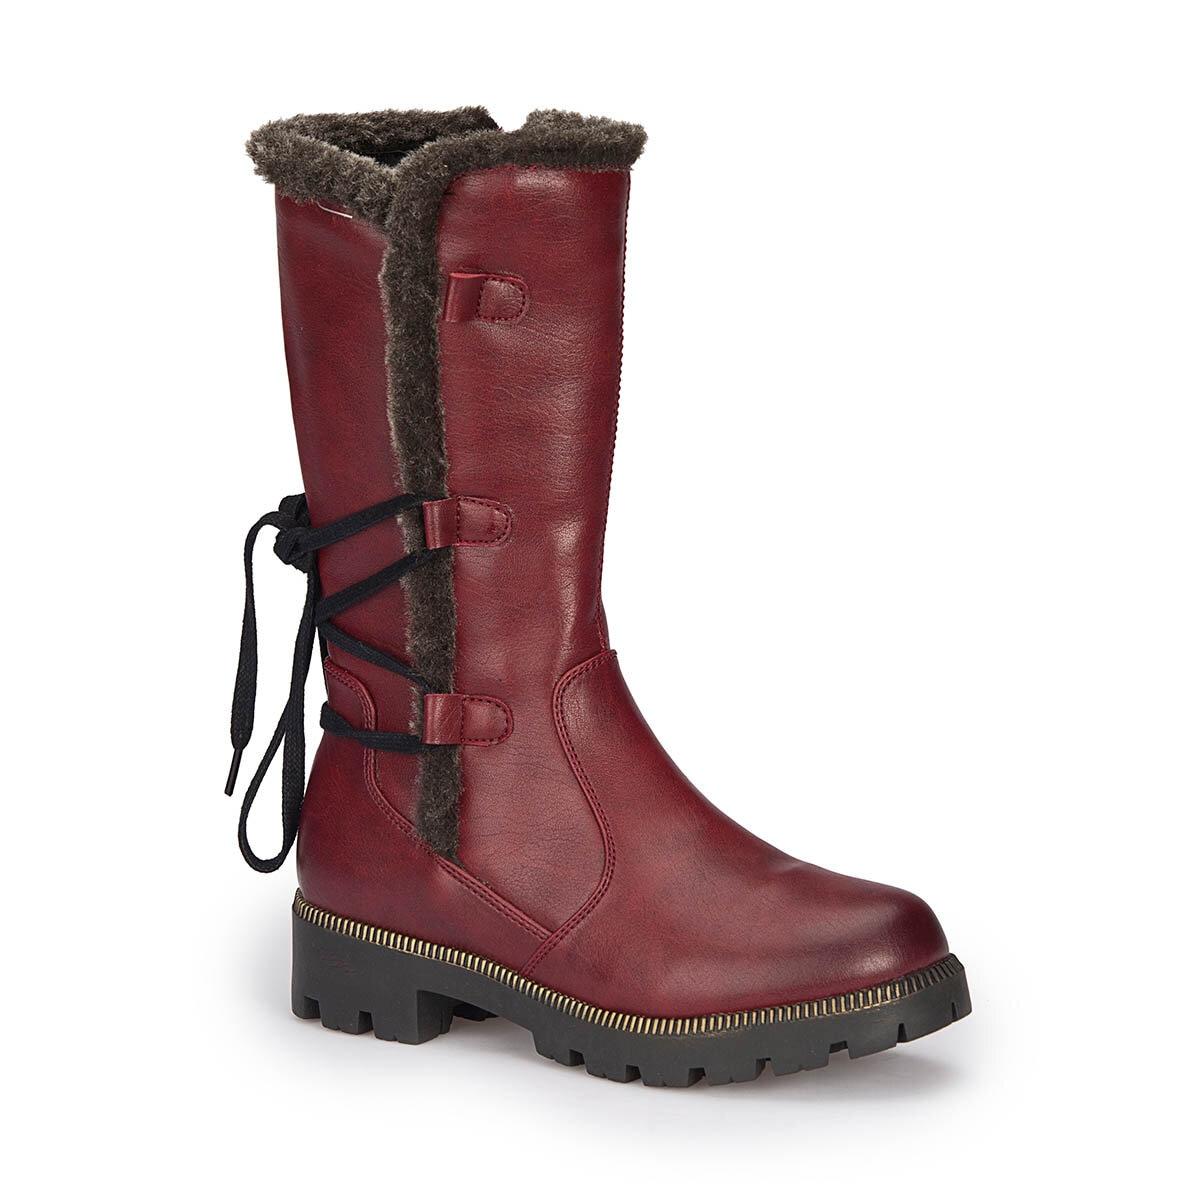 FLO 72. 509814.F Burgundy Female Child Boots Polaris